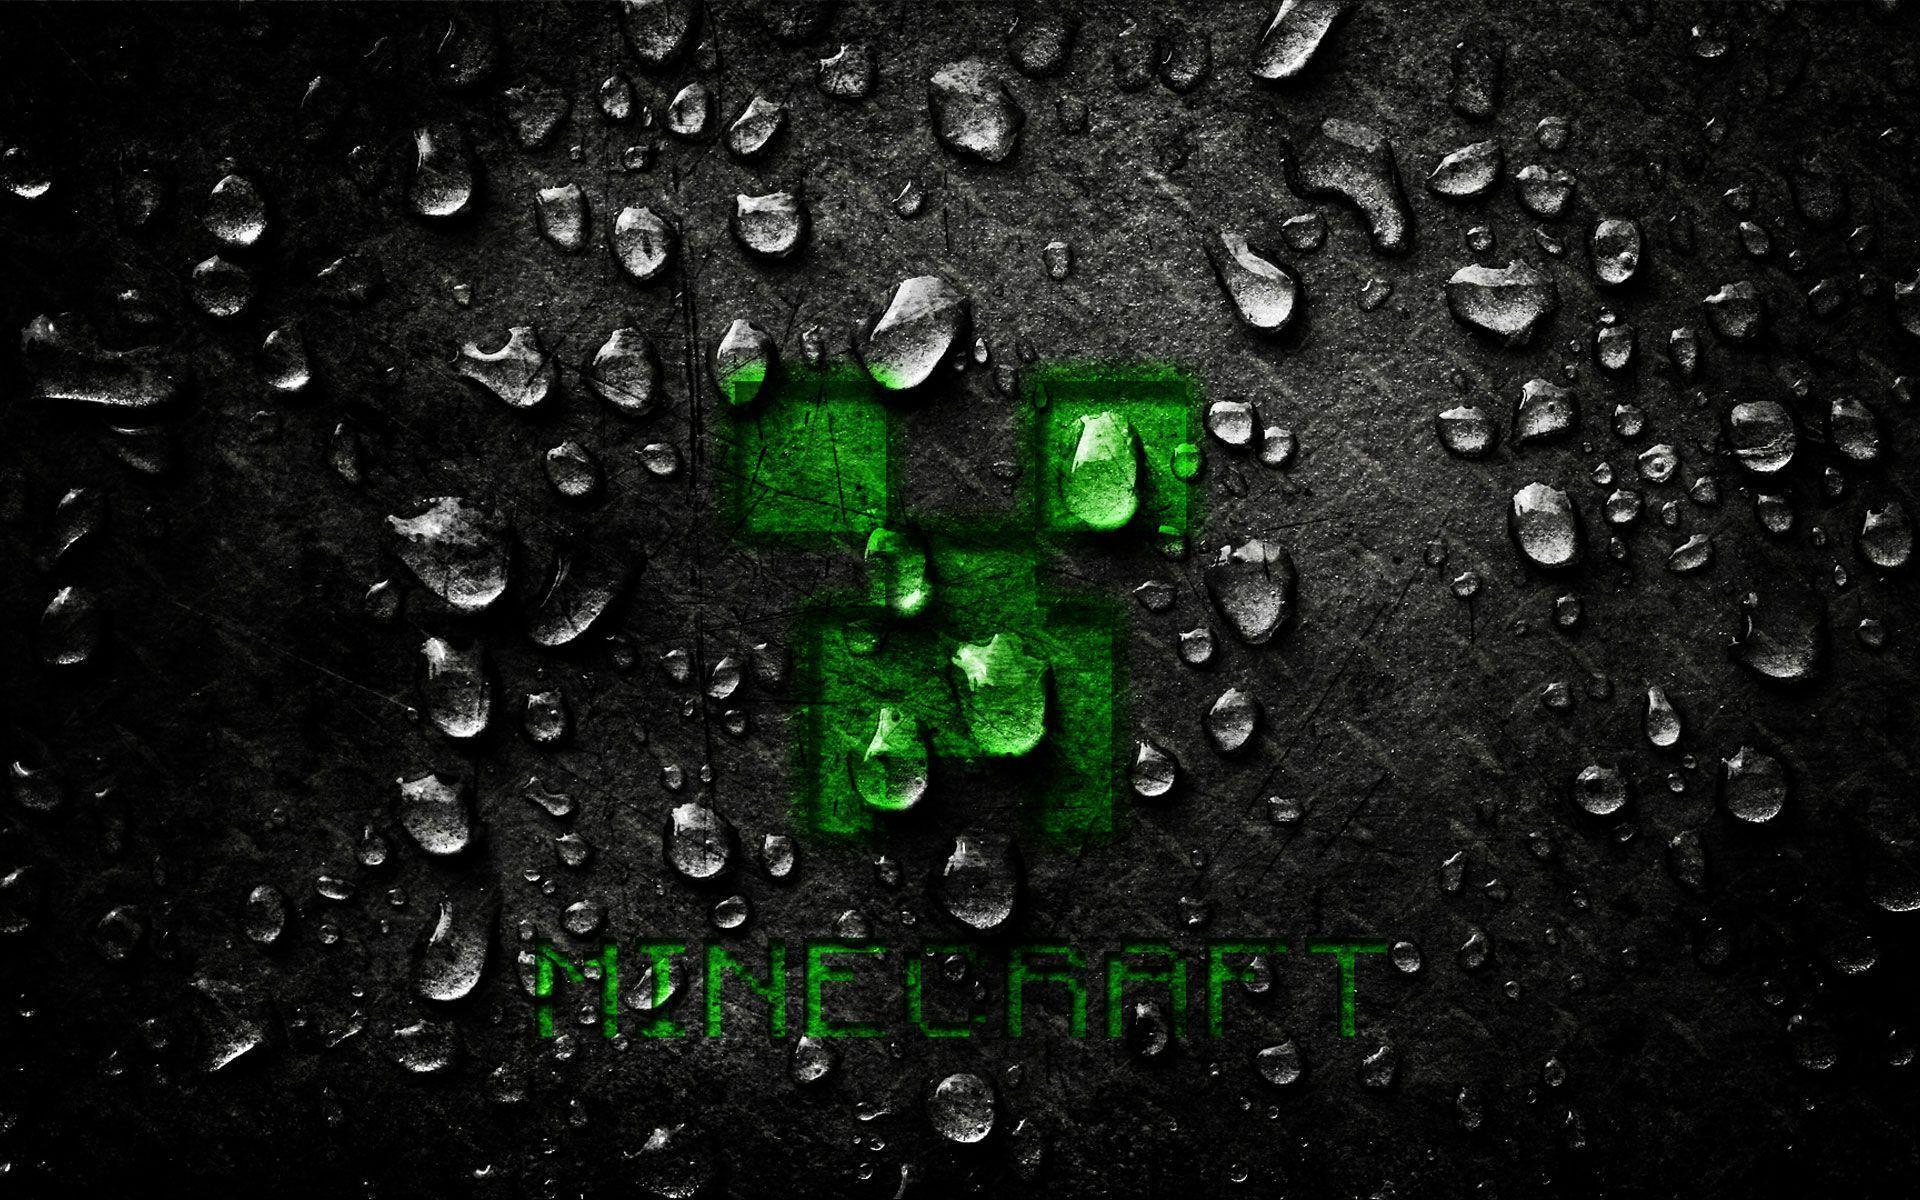 minecraft hd wallpapergotoagn.com | gotoagn.